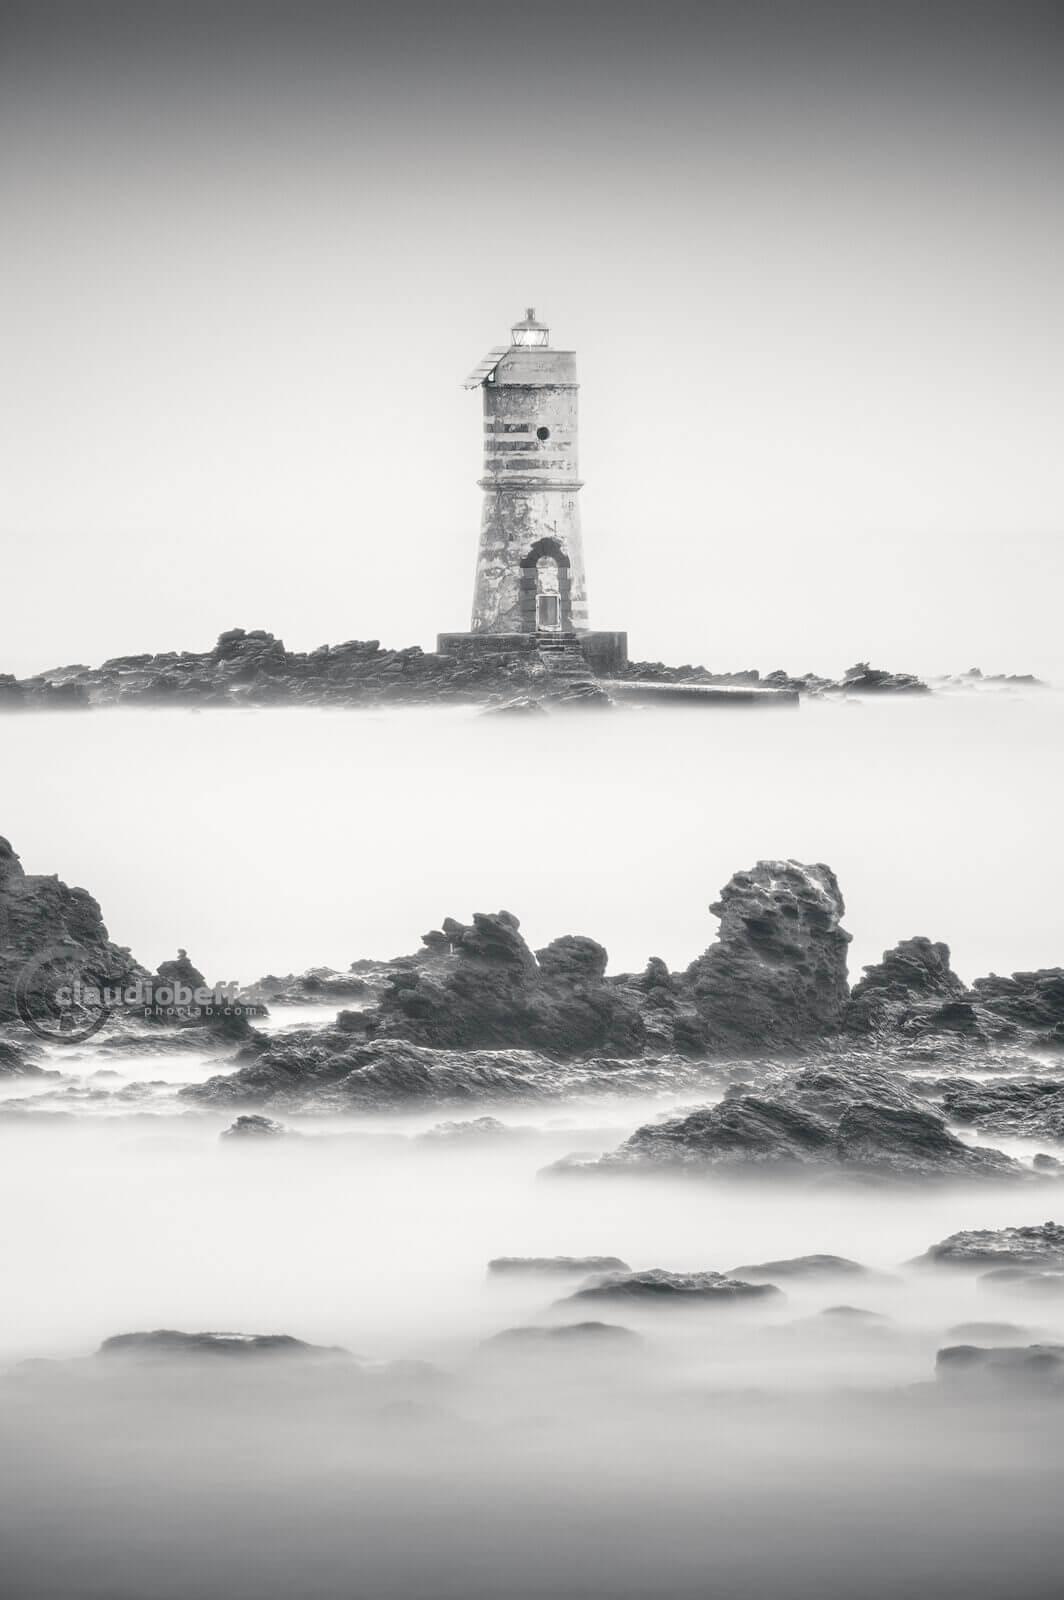 Emerging from the dream, Boat Eater, Mangiabarche, lighthouse, rocks, sea, sardinia, italy, long exposure, minimal, minimalist